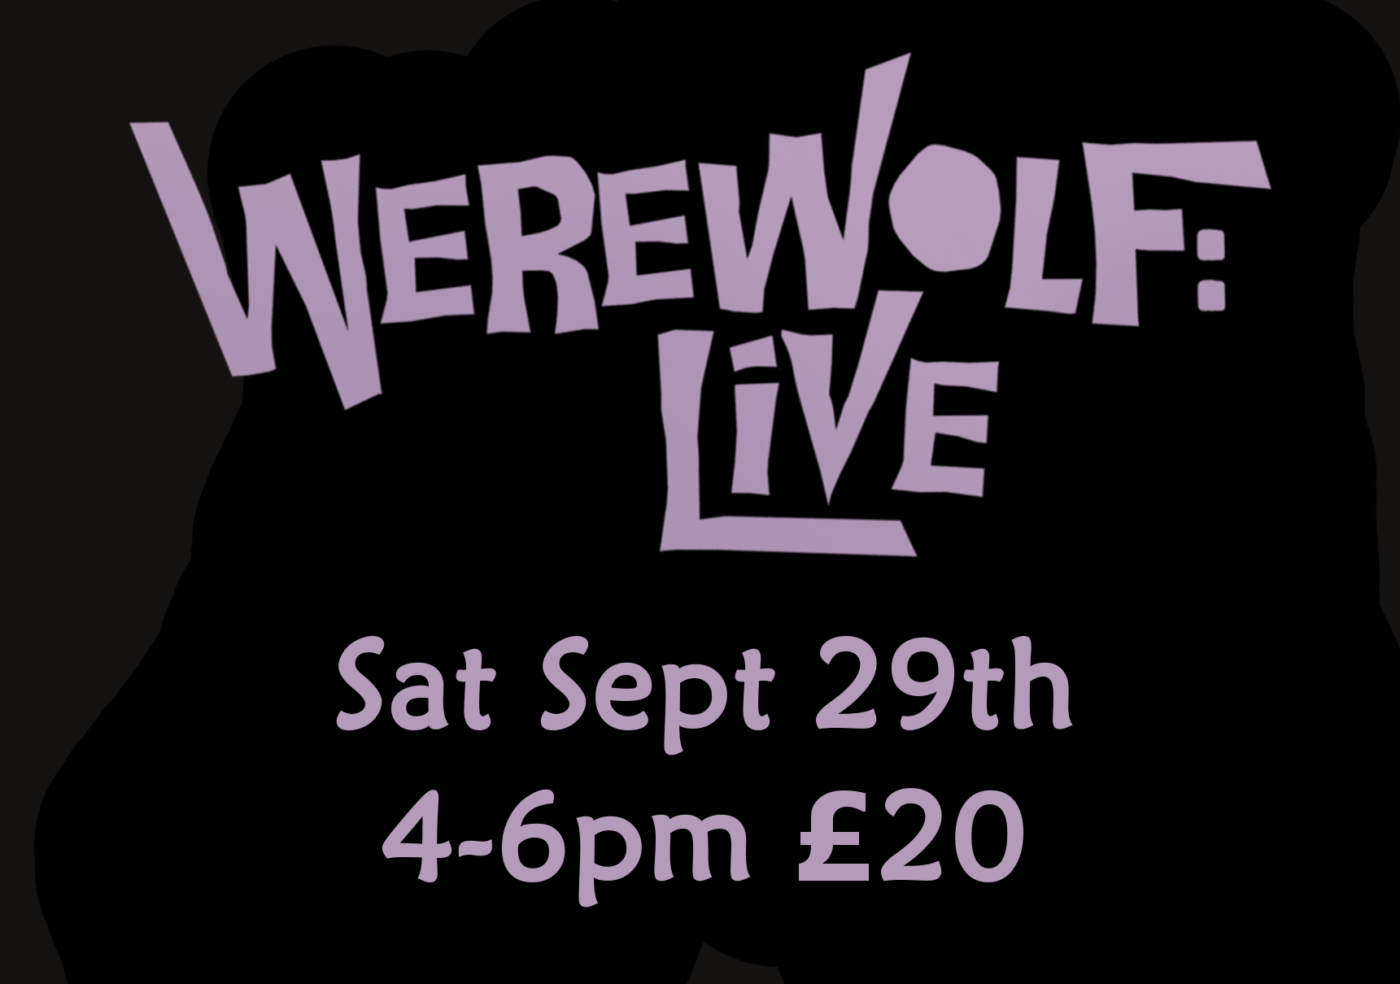 Werewolf Live: An Interactive Comedy Show!